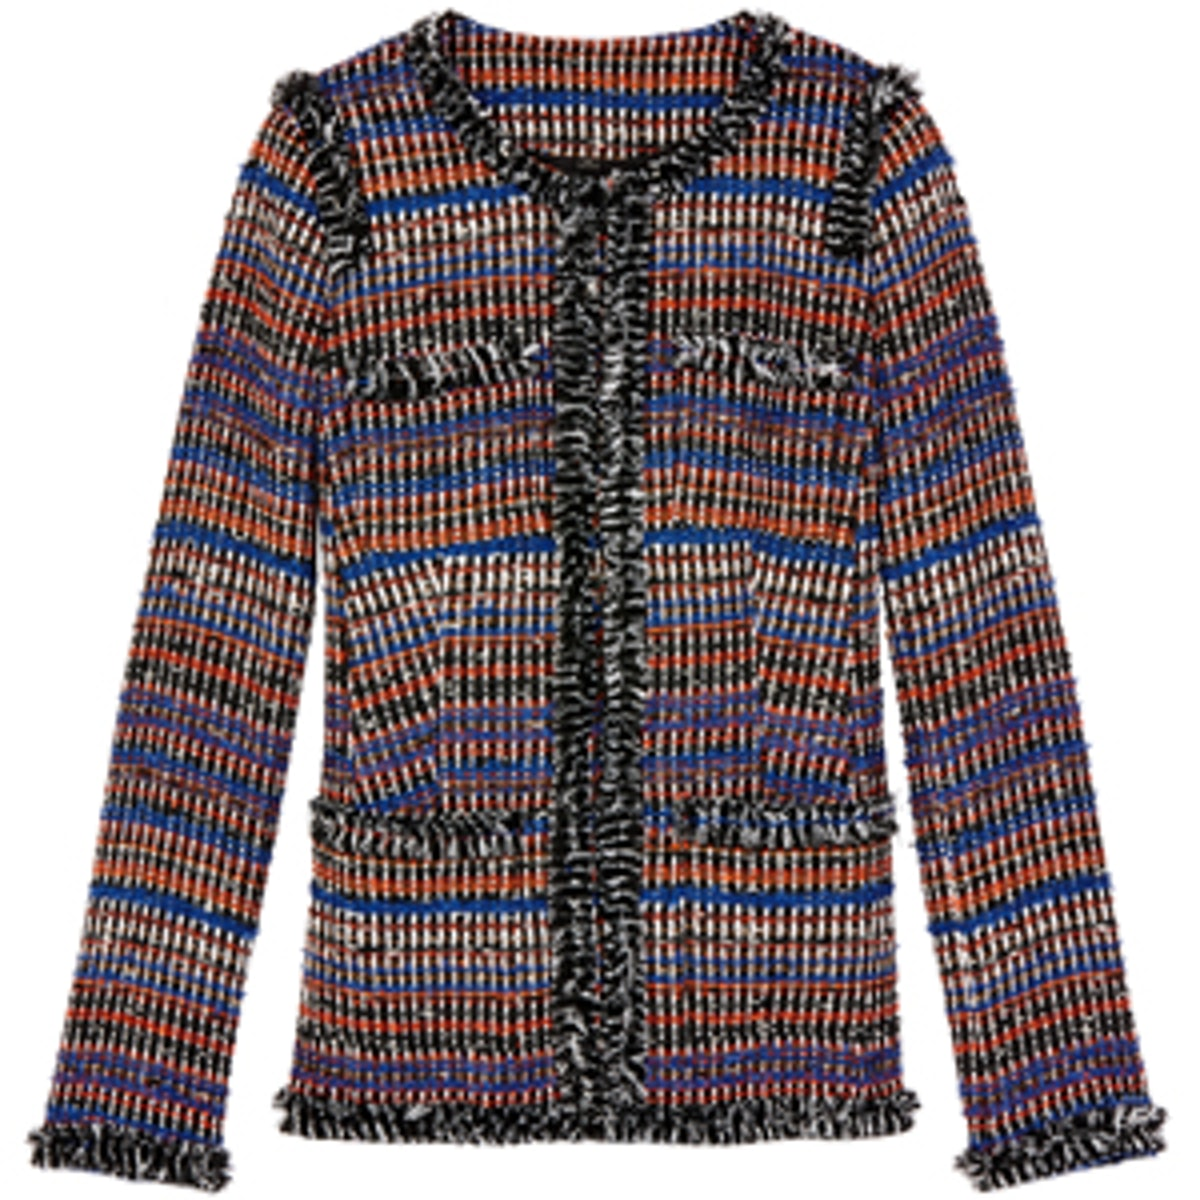 Henri Tweed Jacket